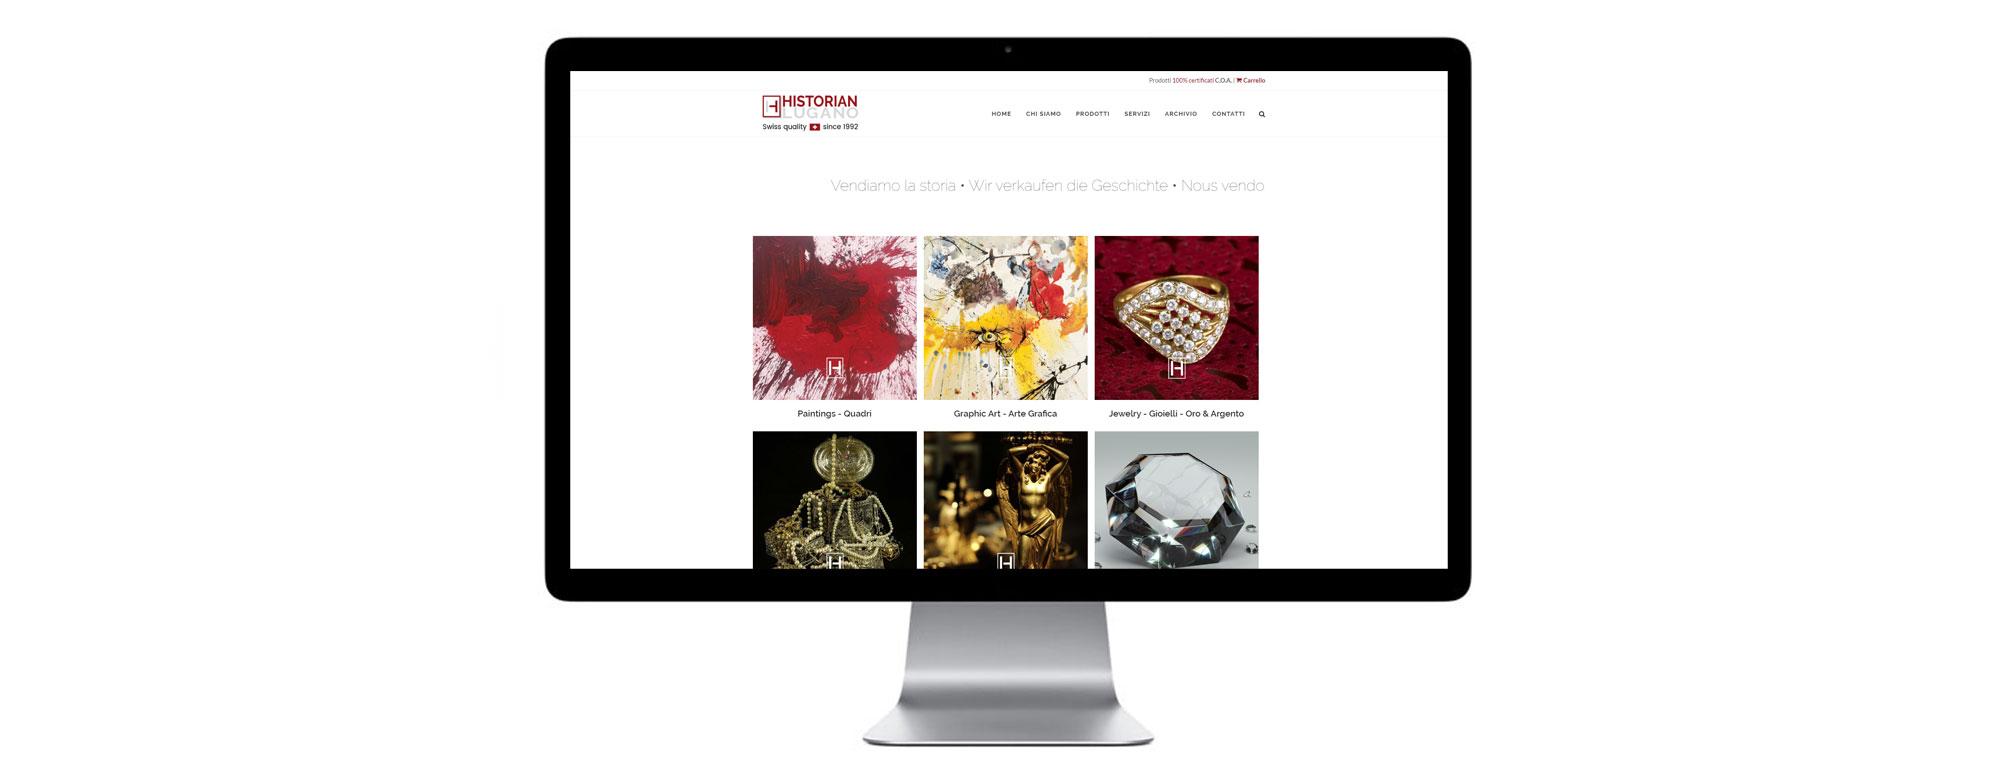 web design a schede